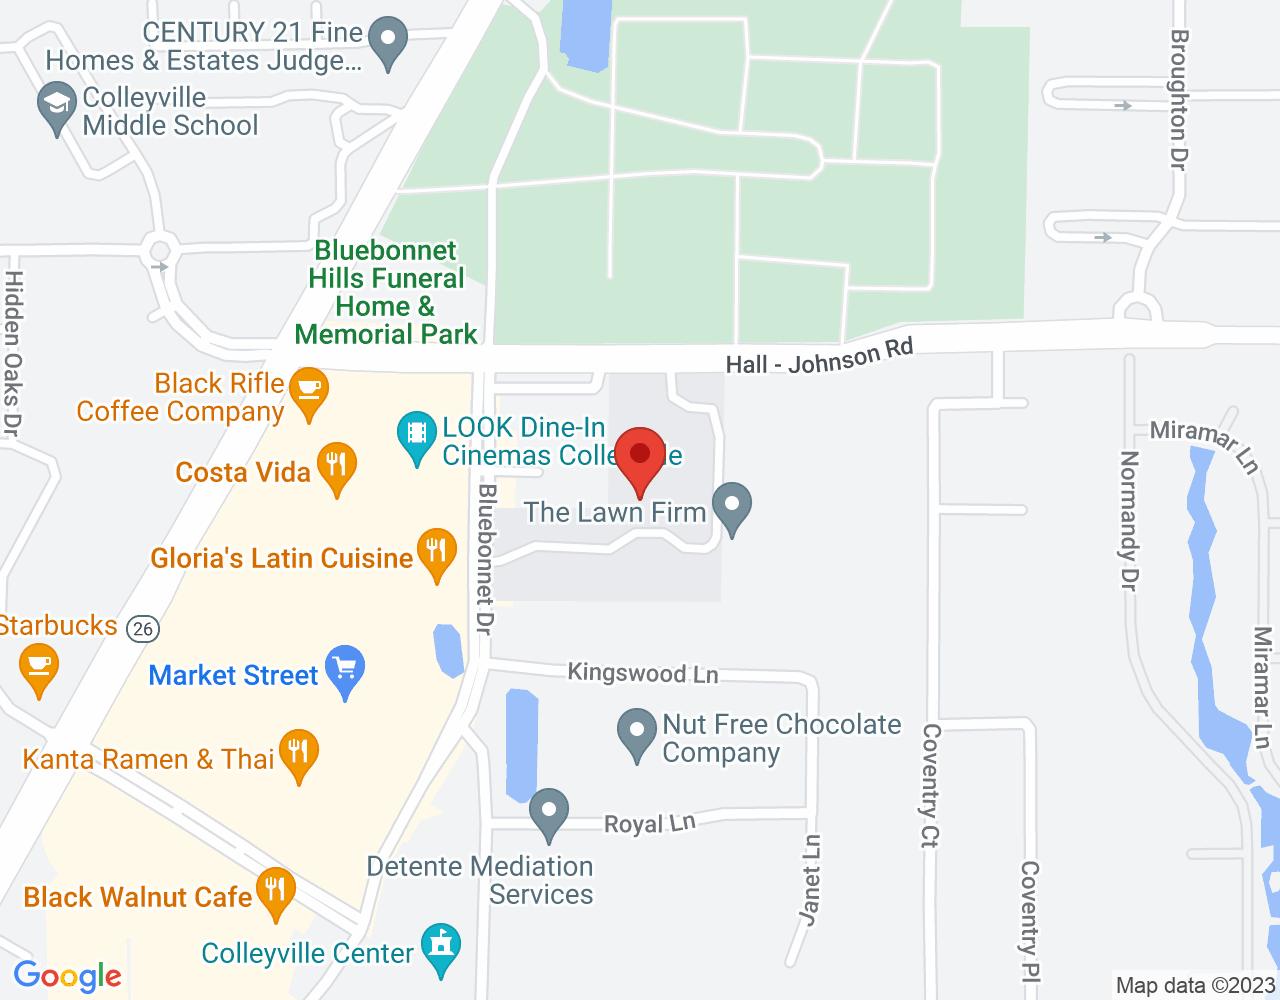 1513 Hall - Johnson Rd, Colleyville, TX 76034, USA